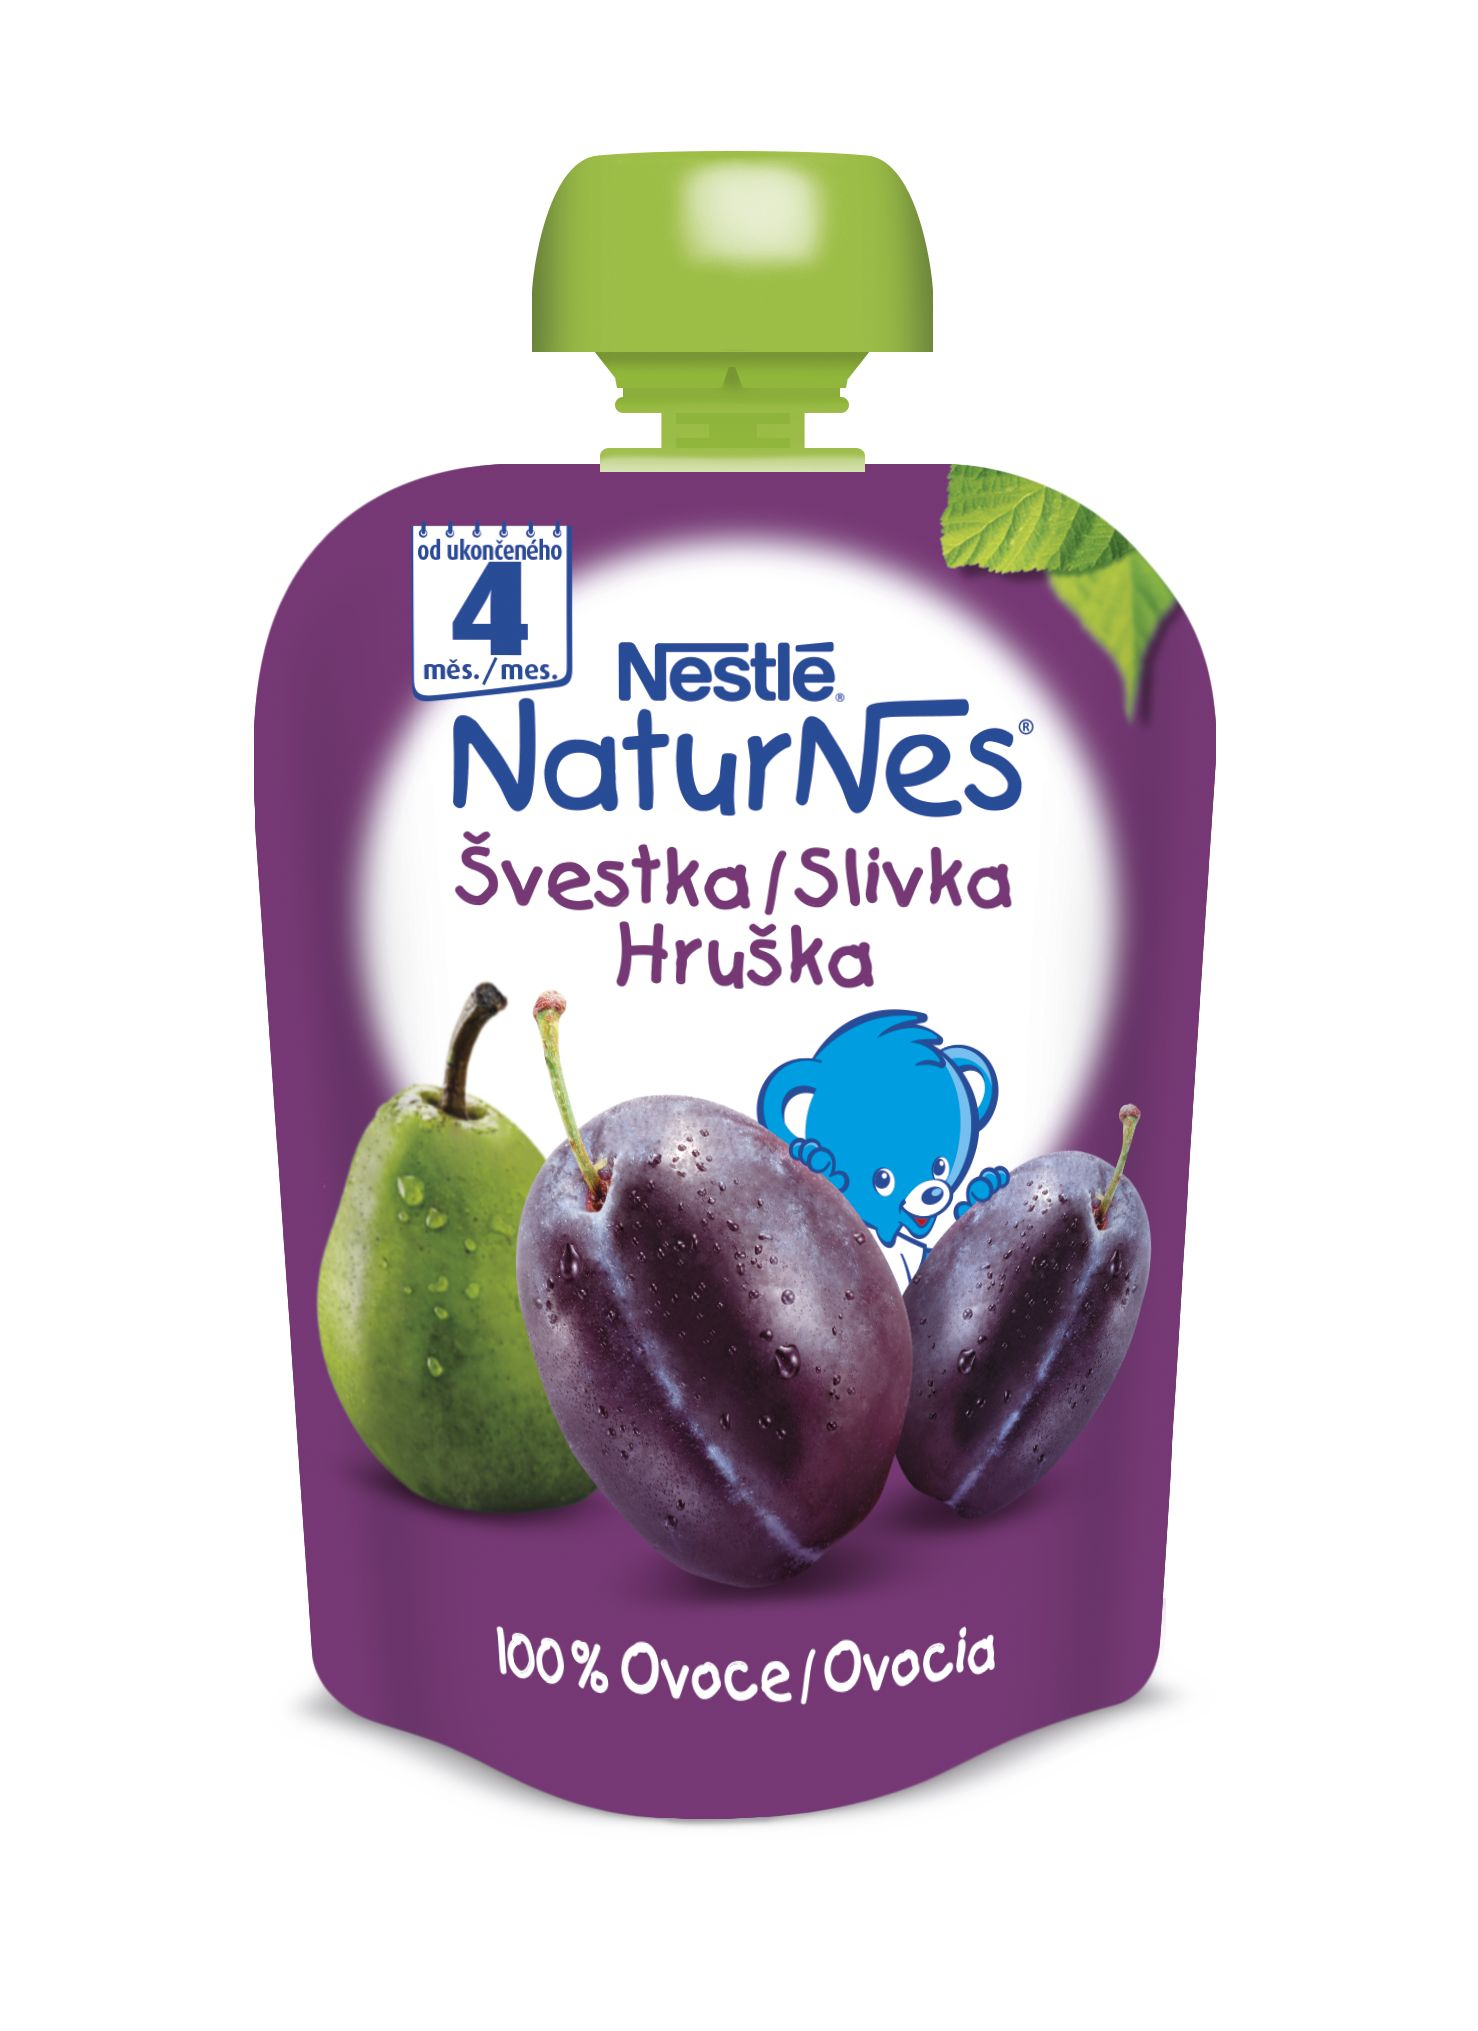 Nestlé Naturnes Švestka hruška kapsička 90 g